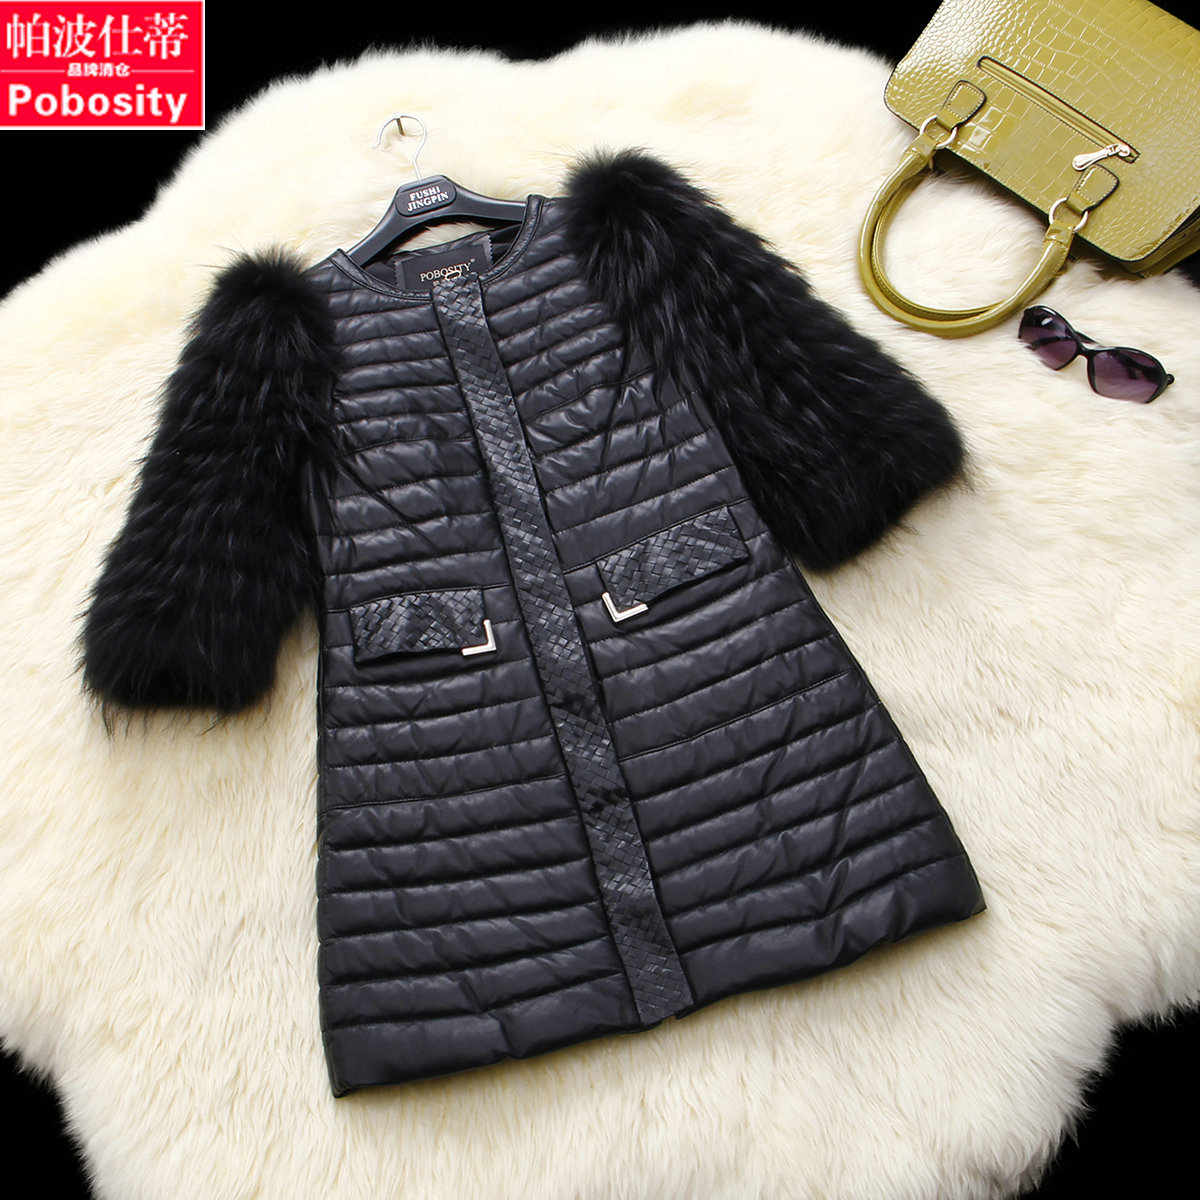 Paabo Ши Haining кожа кожа женщин енот ножке 2016 новые волосы овец кожи перо куртка 2505CWD